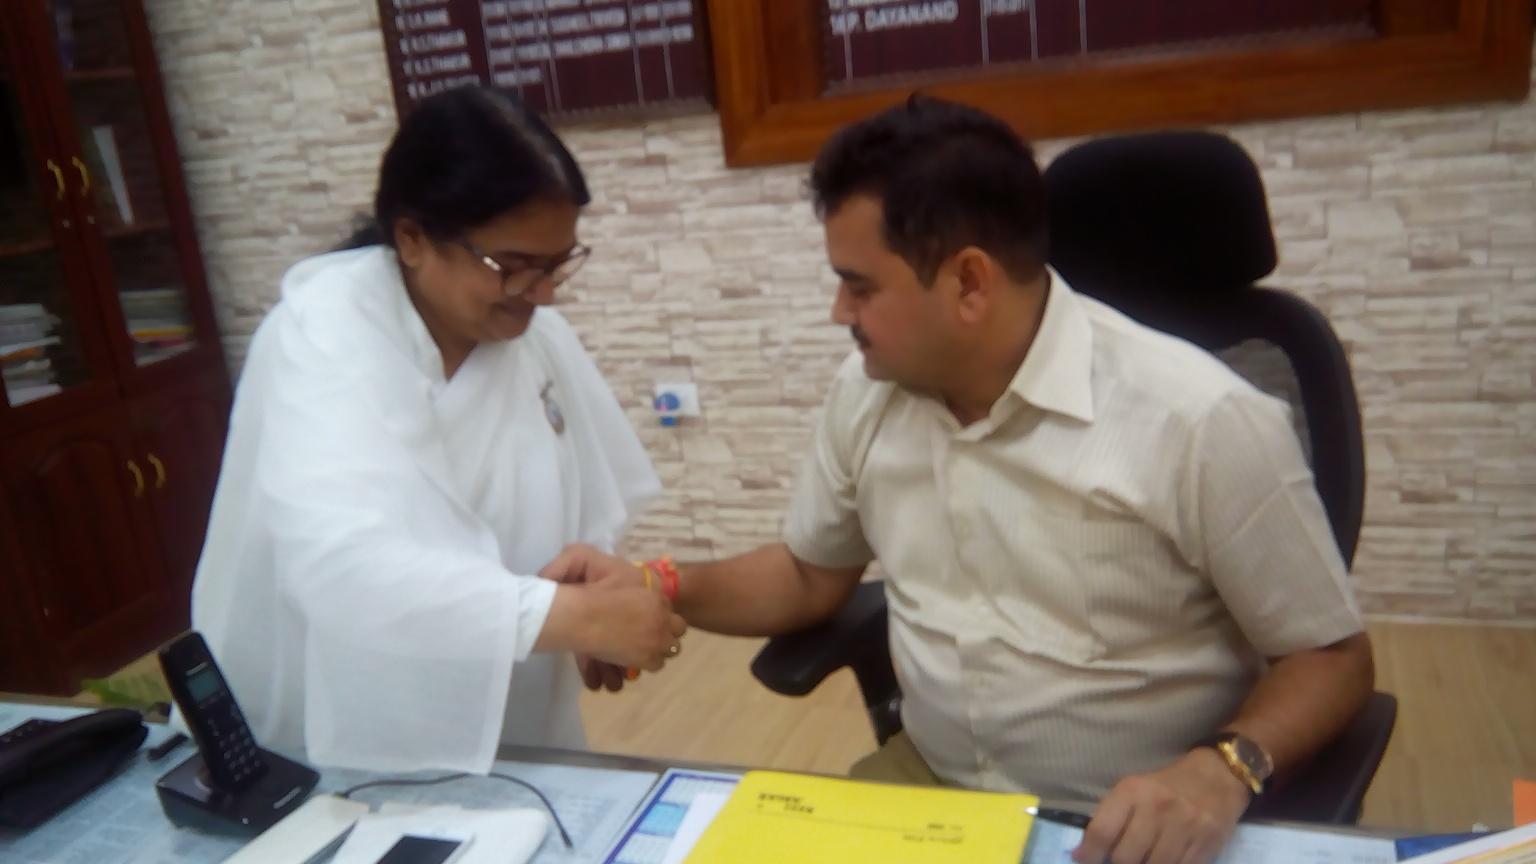 03 to Distt. Collector (Bilaspur) Bro. P. Dayanand by BK Manju_Bilaspur Tikrapara (2)